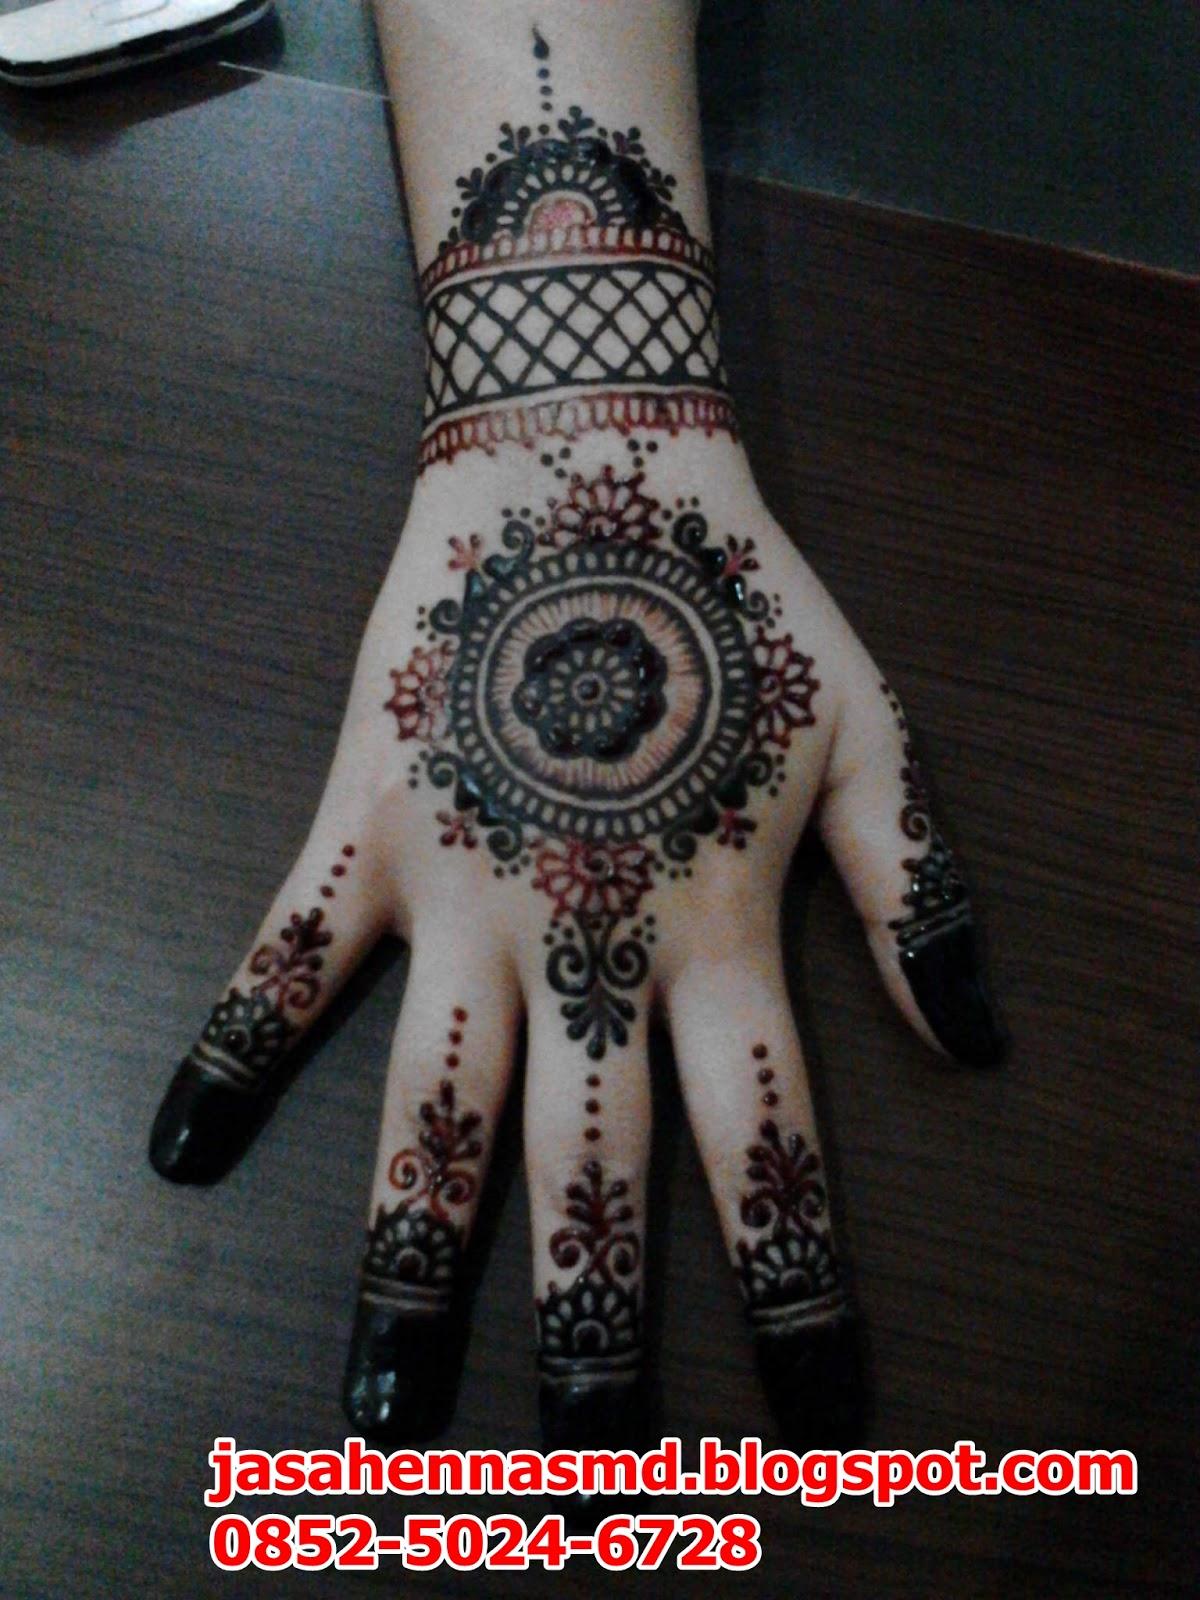 Jasa Henna Pengantin Di Samarinda Amanah Jasa Henna Tangan Dan Kaki